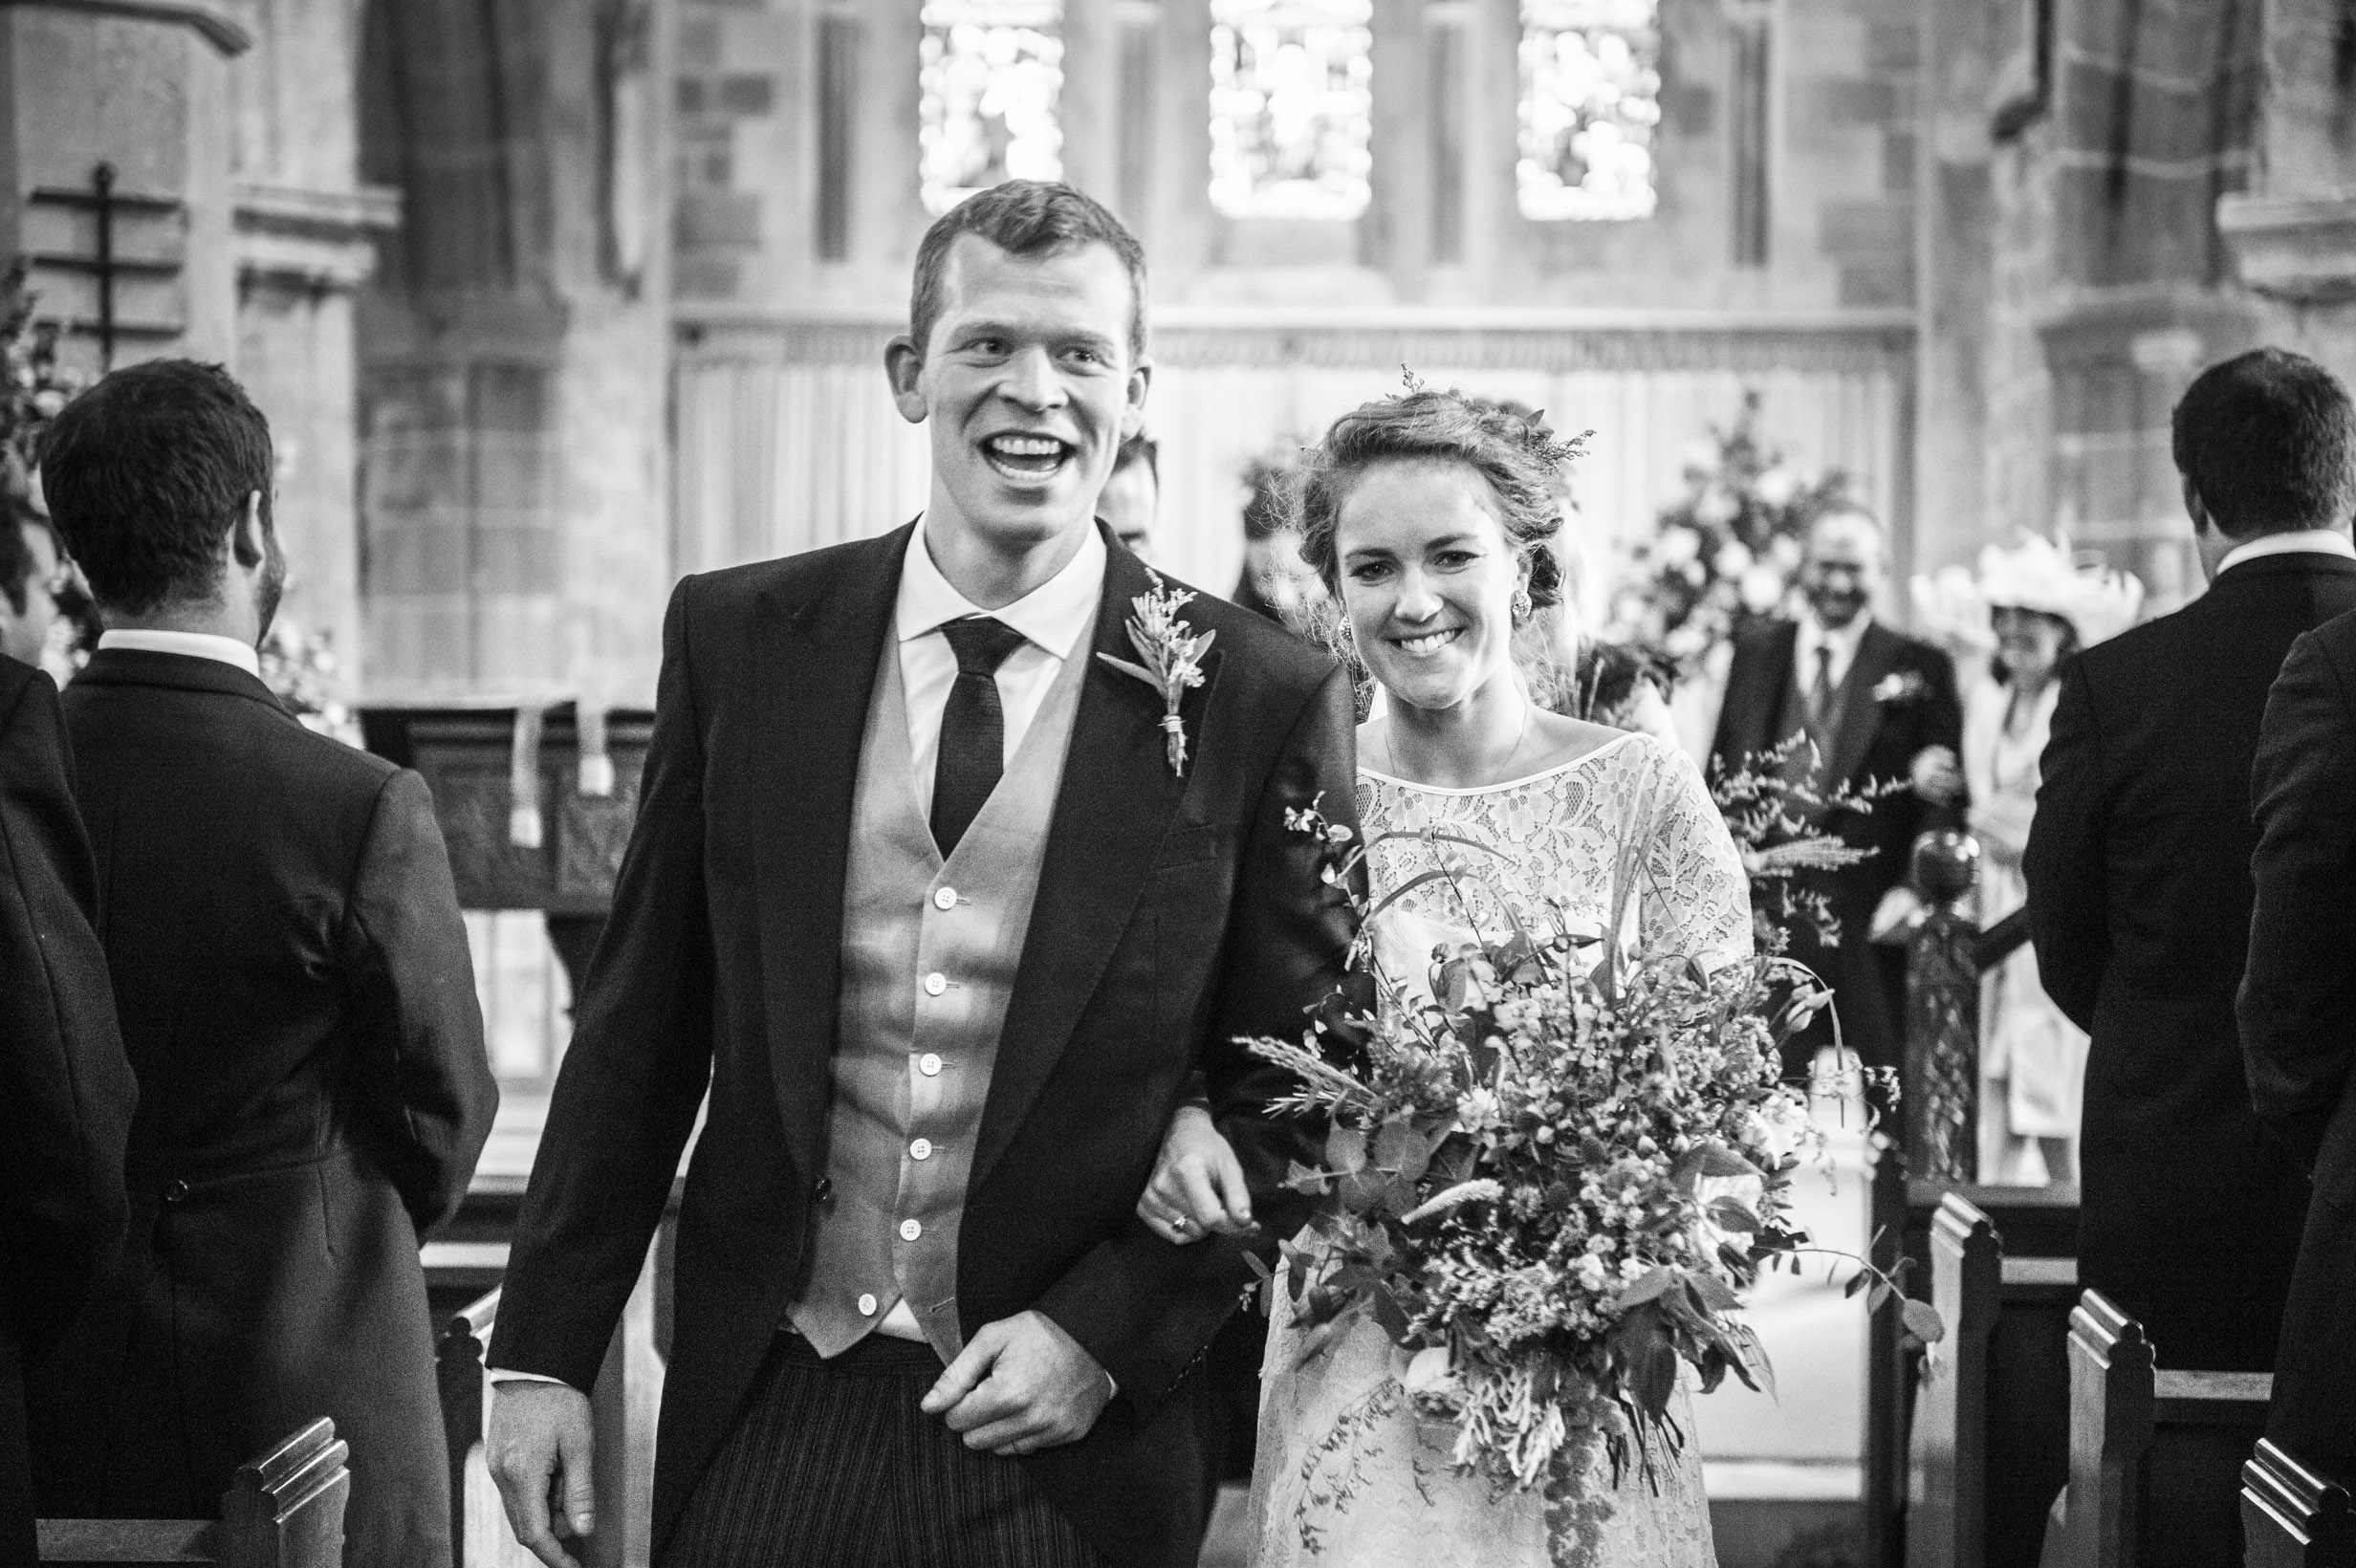 Beautiful bride Imogen wore a lace wedding dress by Halfpenny London